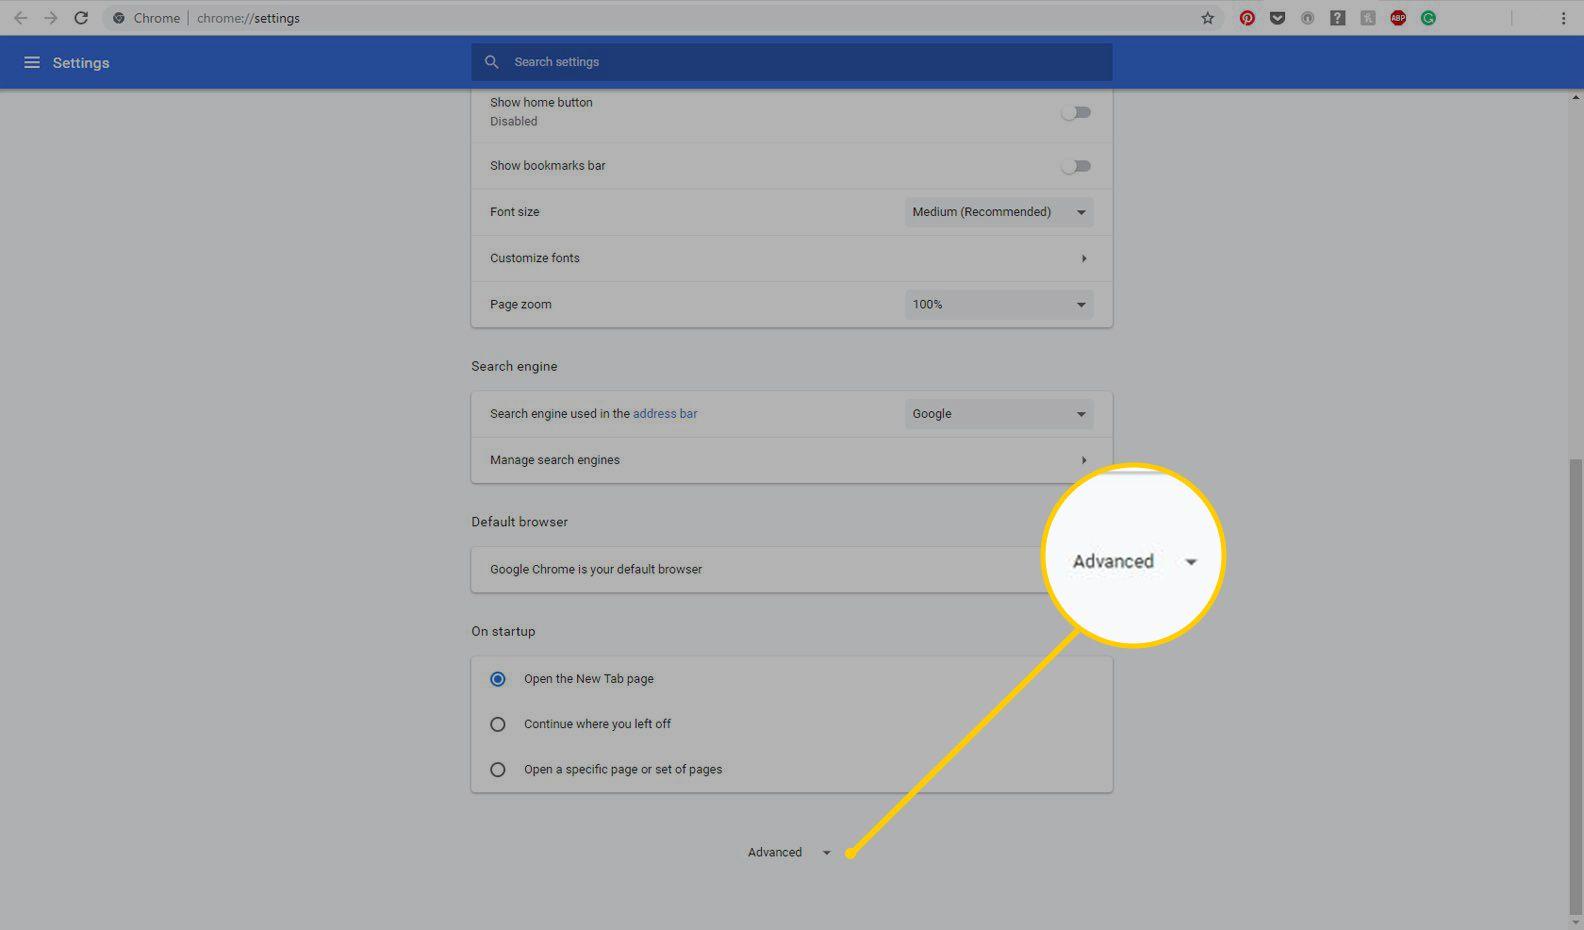 Advanced settings menu in Chrome